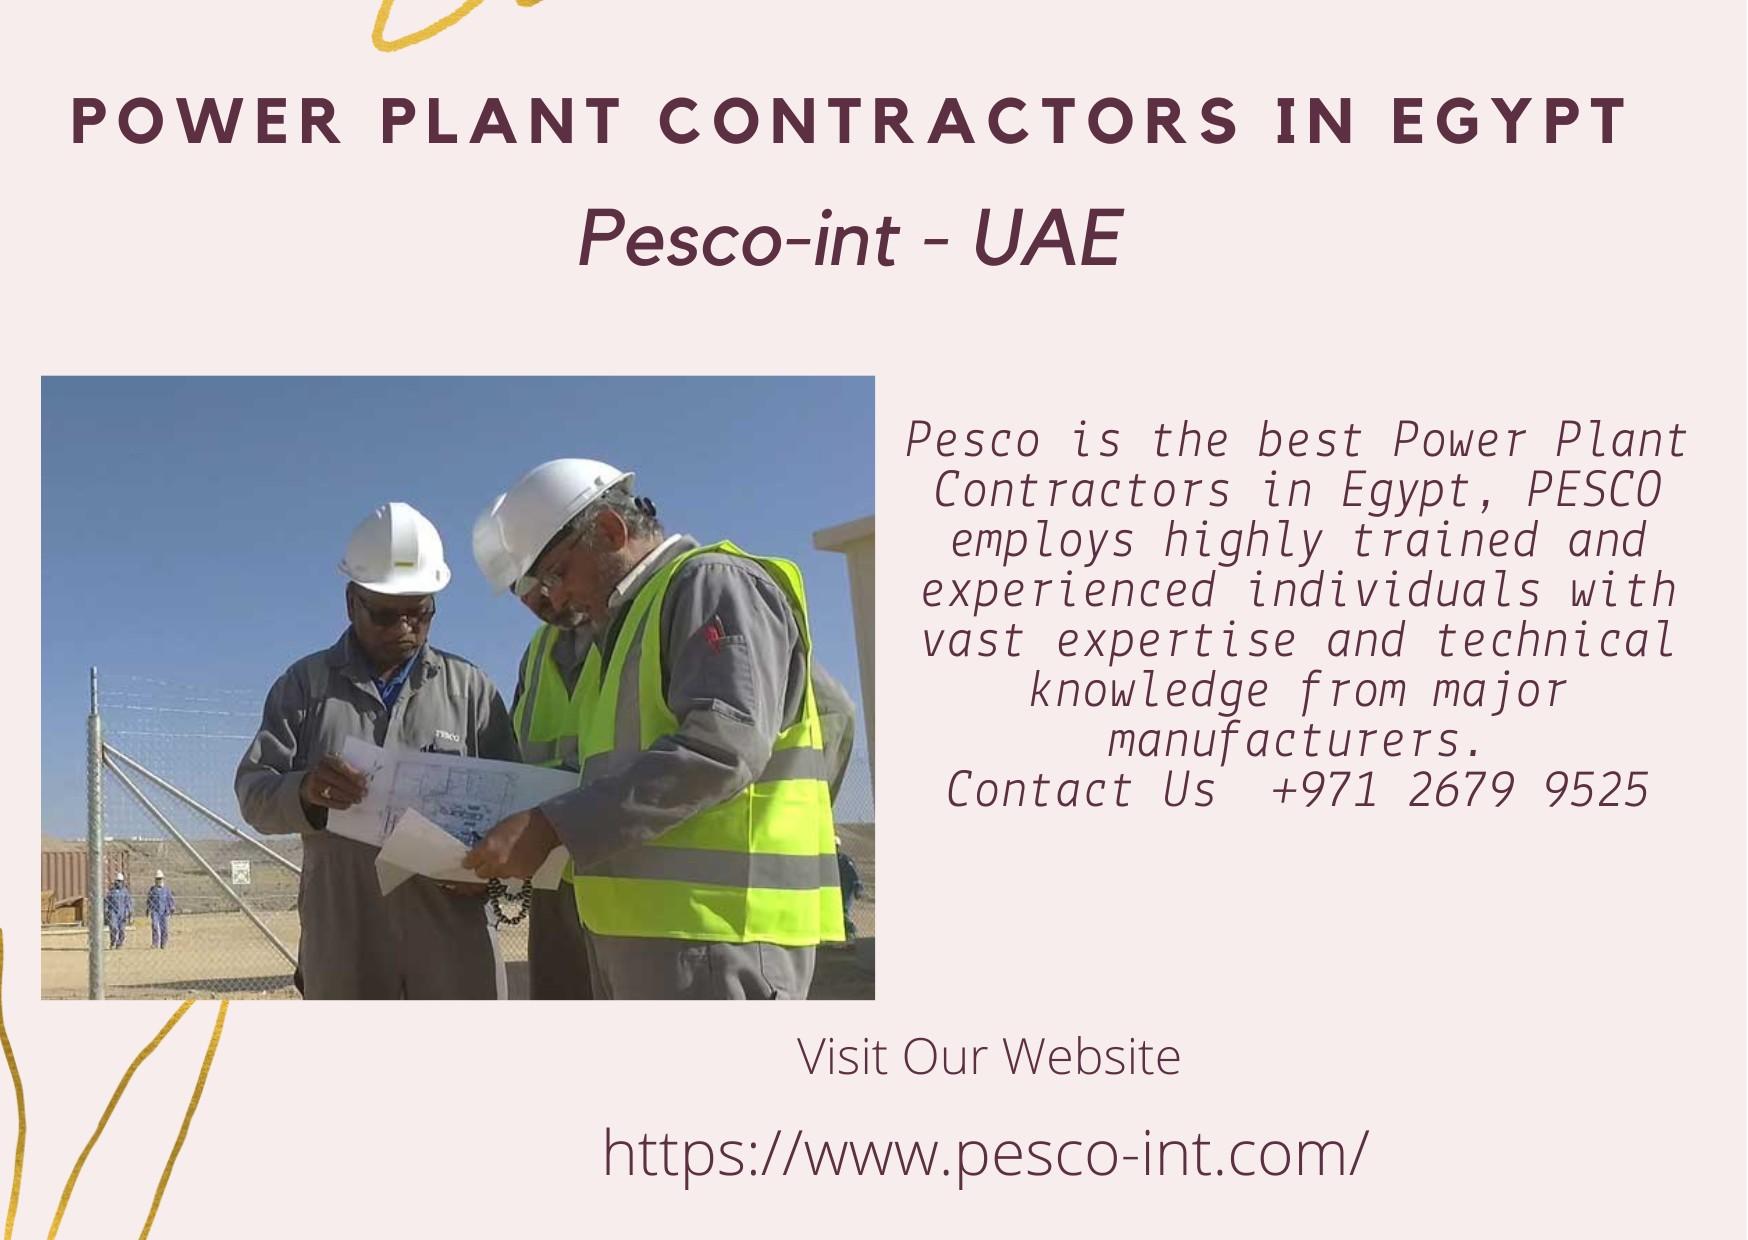 Power Plant Contractors in Egypt | Pesco-int - UAE